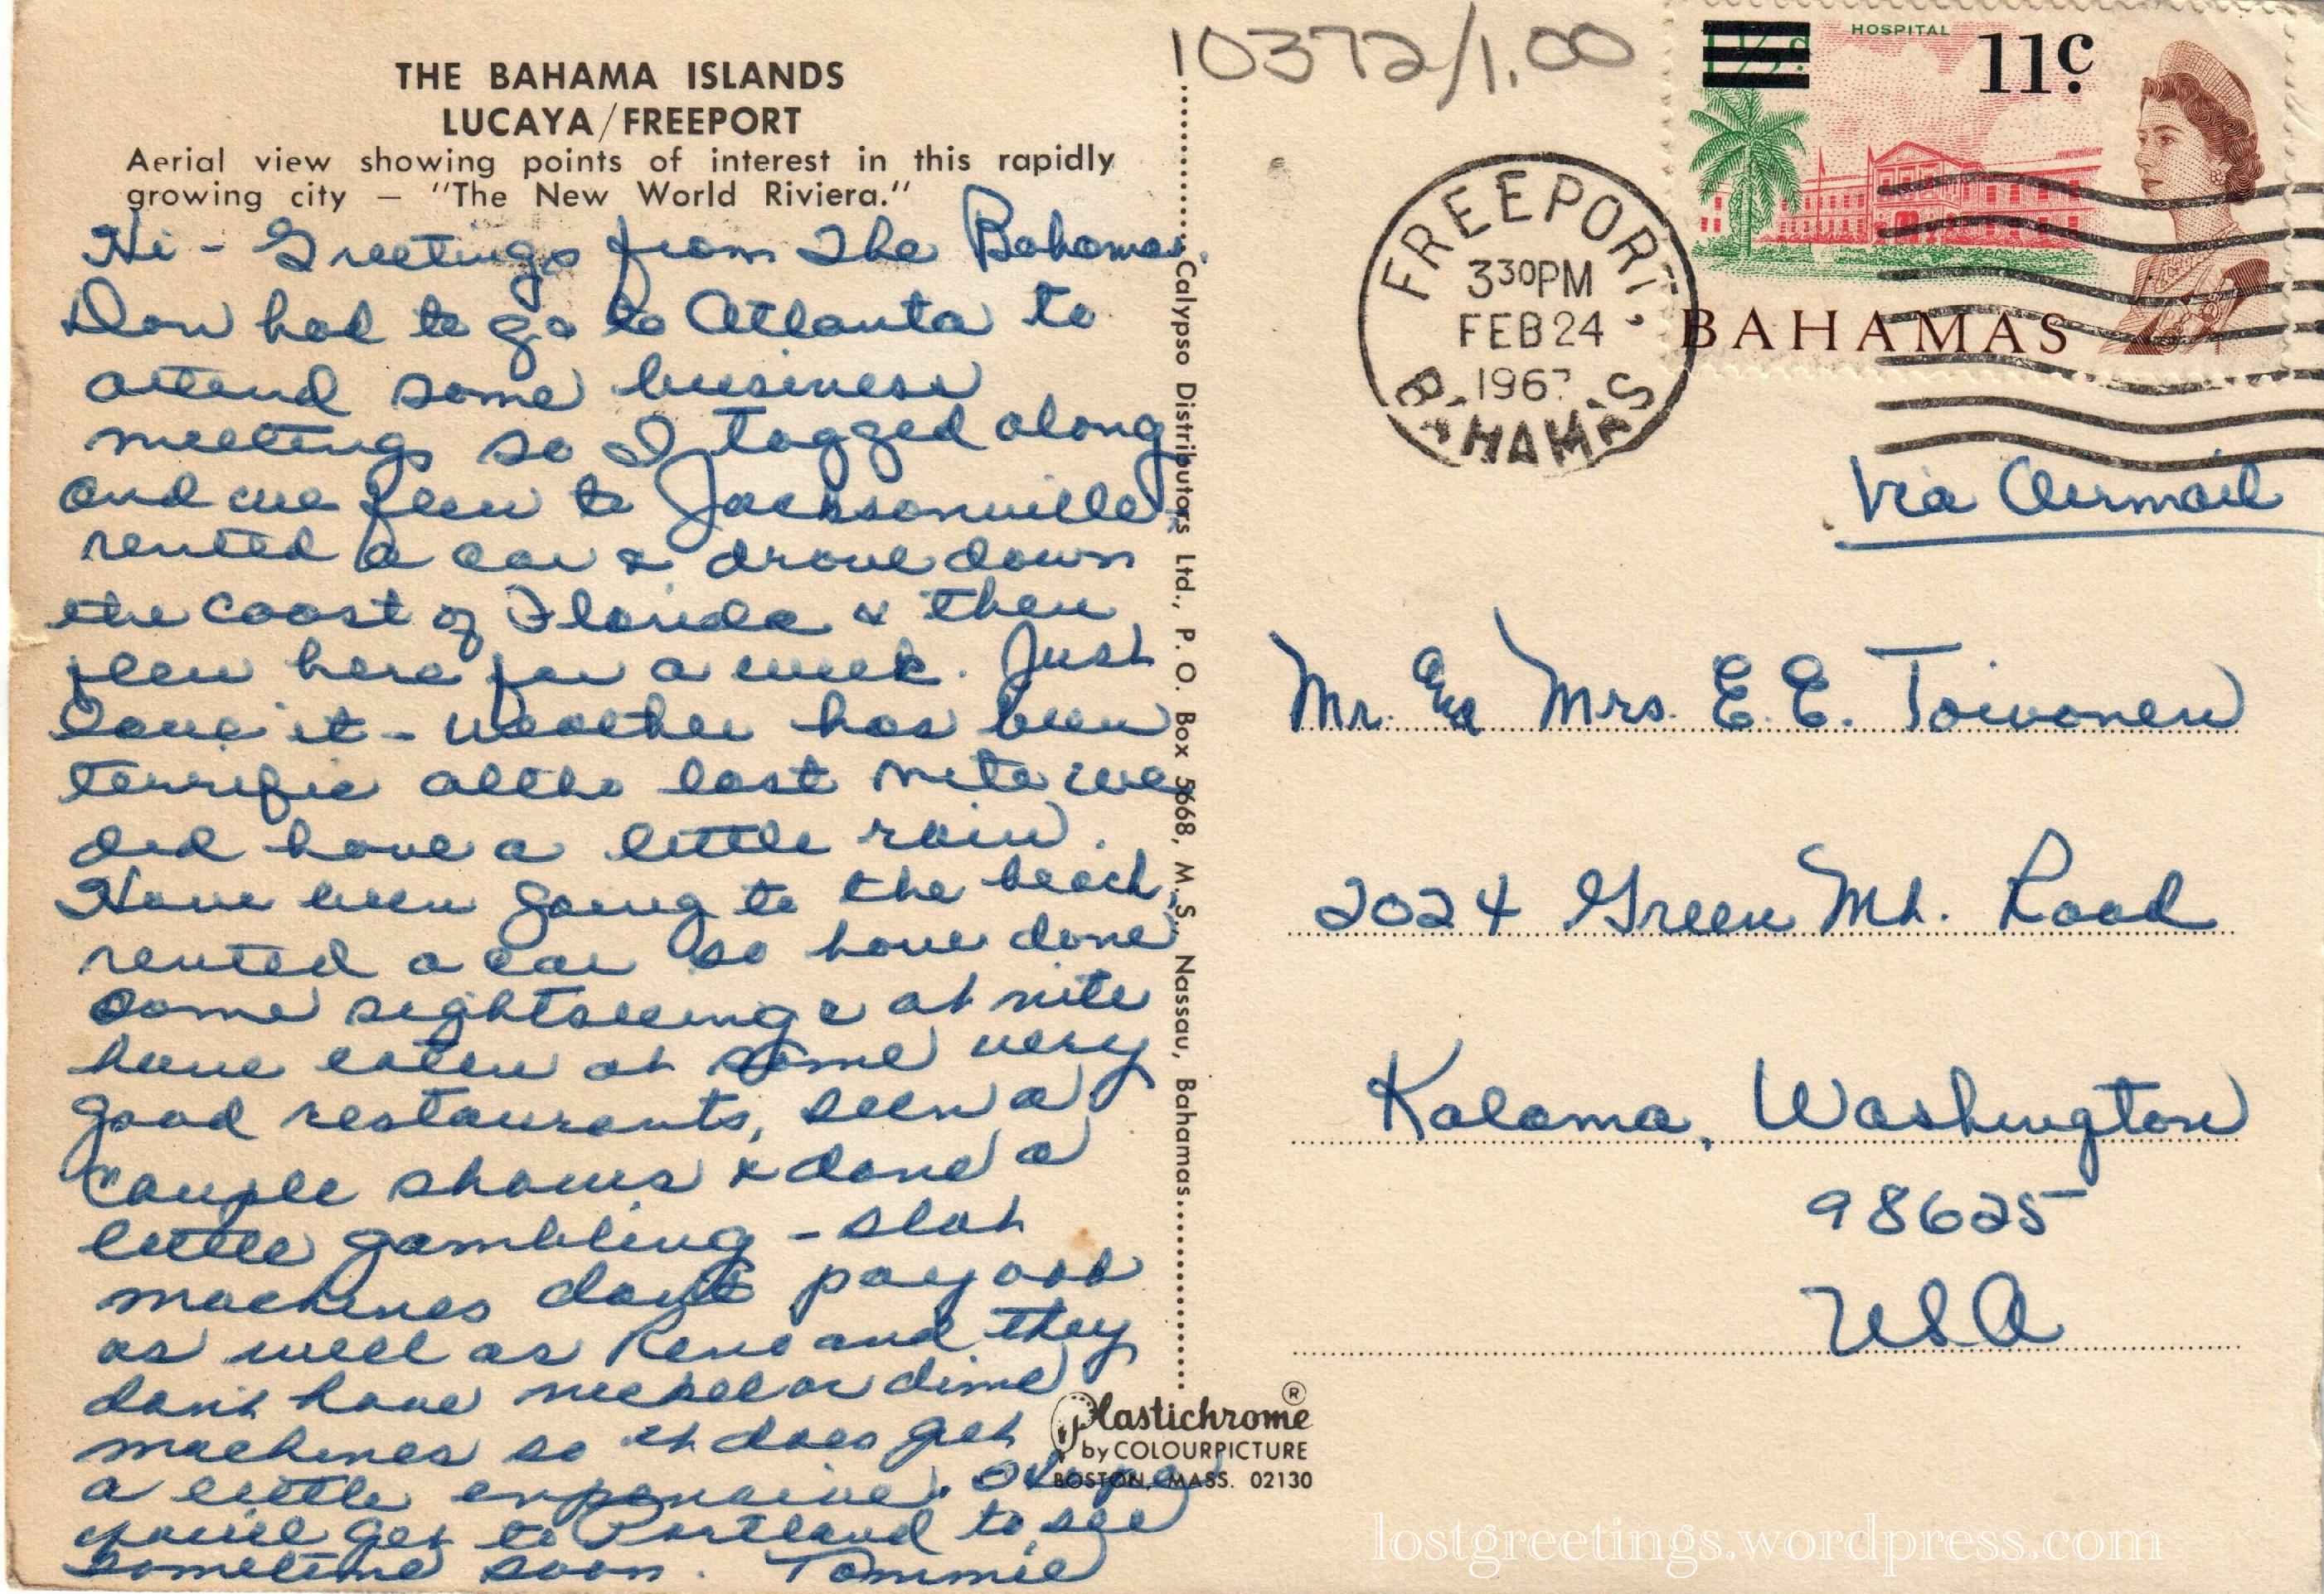 1967 Travel Postcard Message - Freeport, Bahamas lg